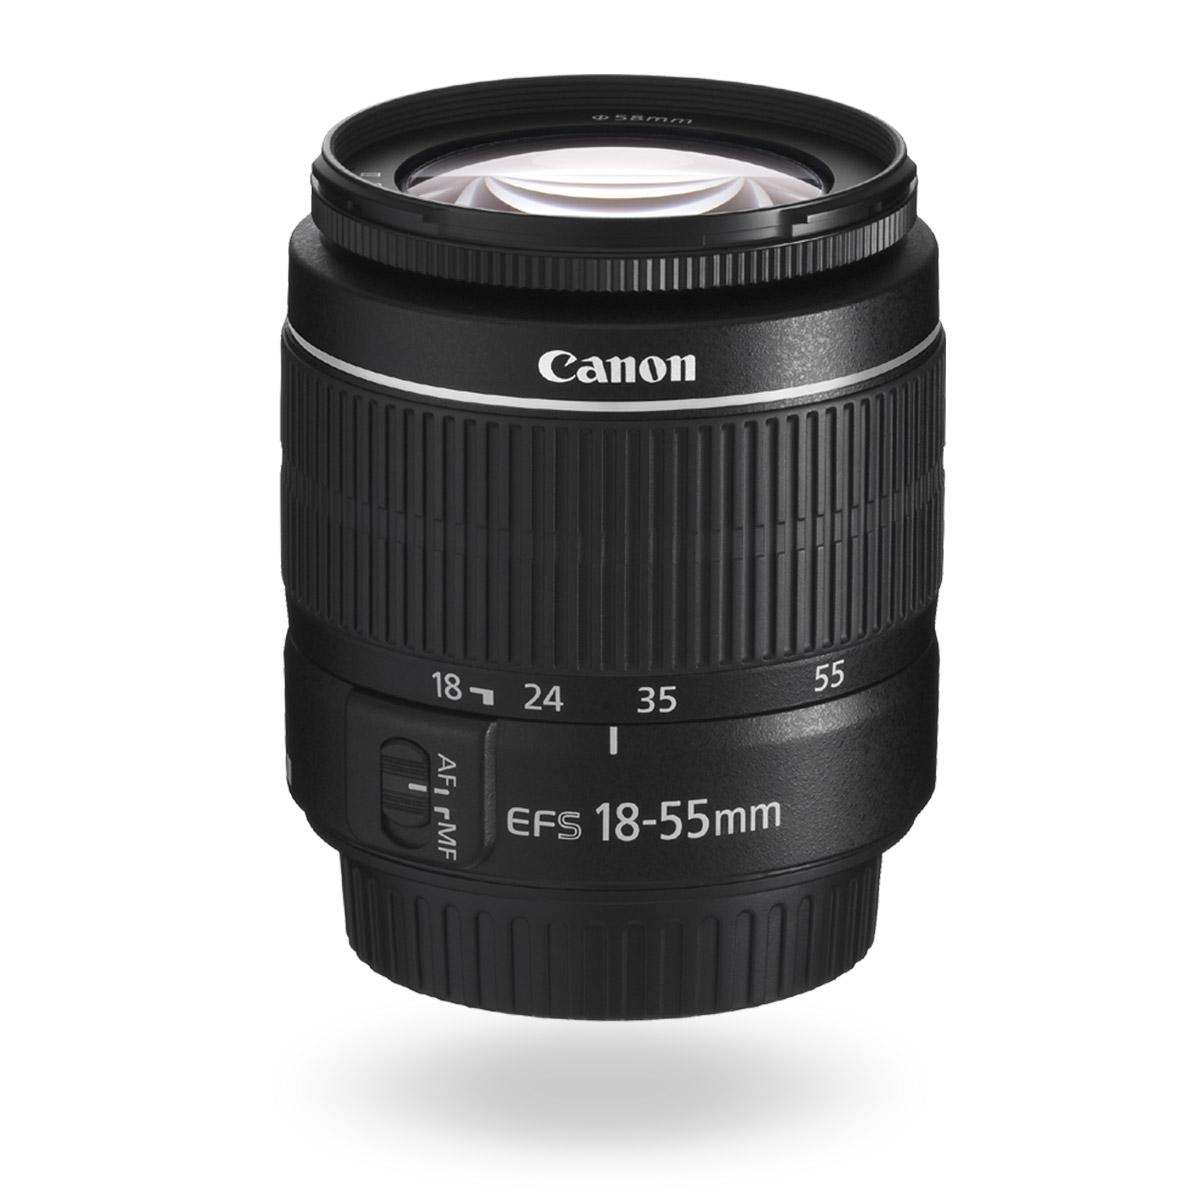 EF-S 18-55mm f/3.5-5.6 III lens